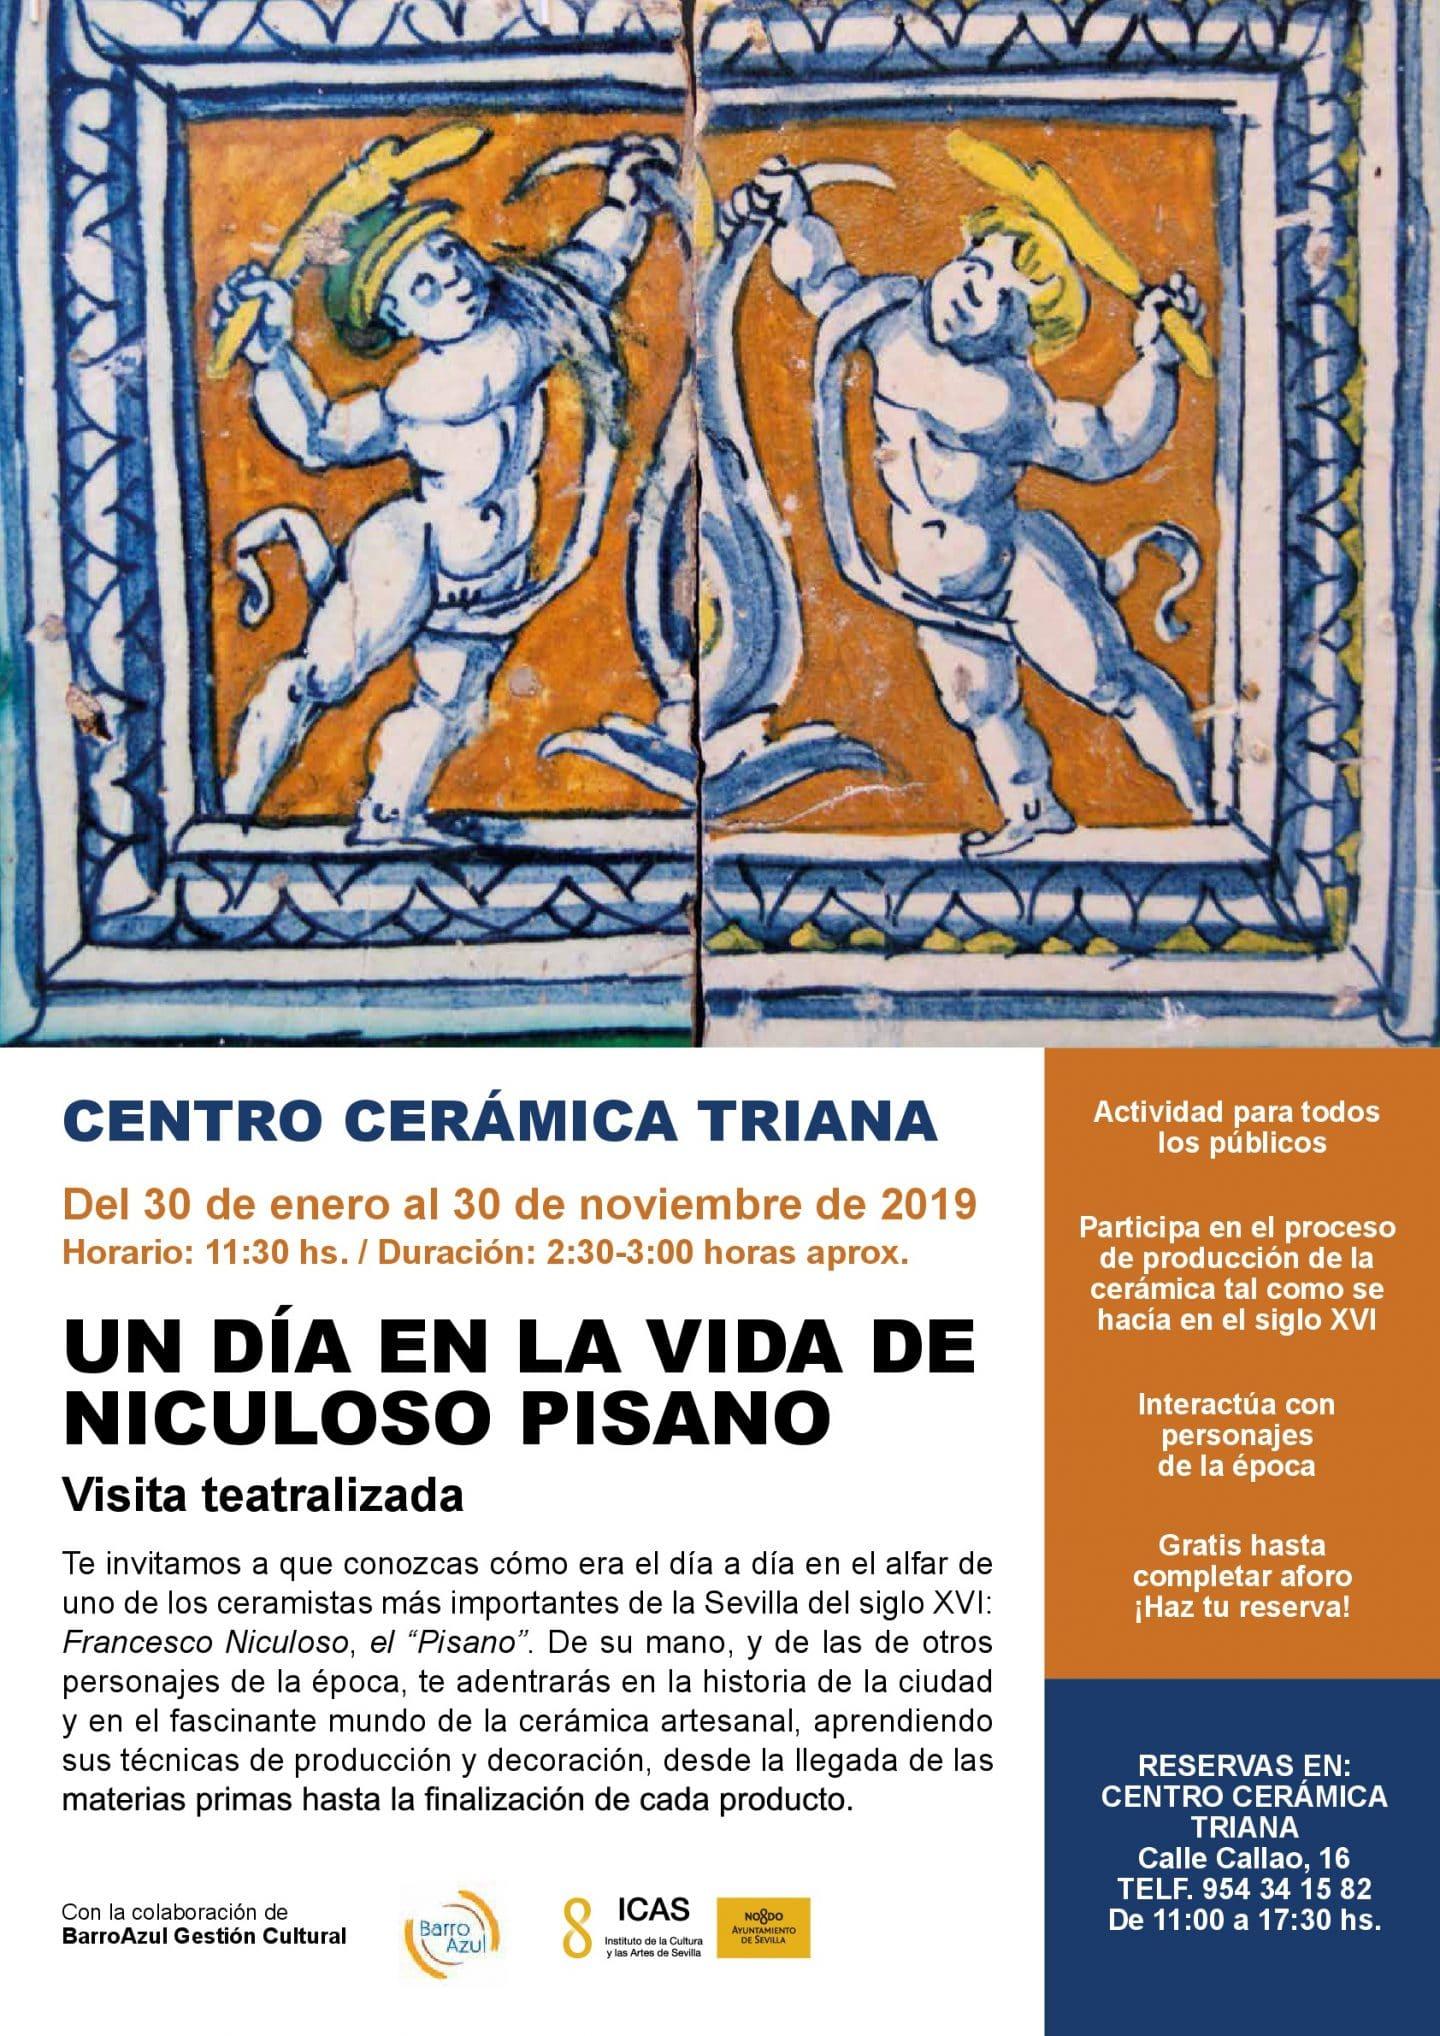 centro-ceramica-triana